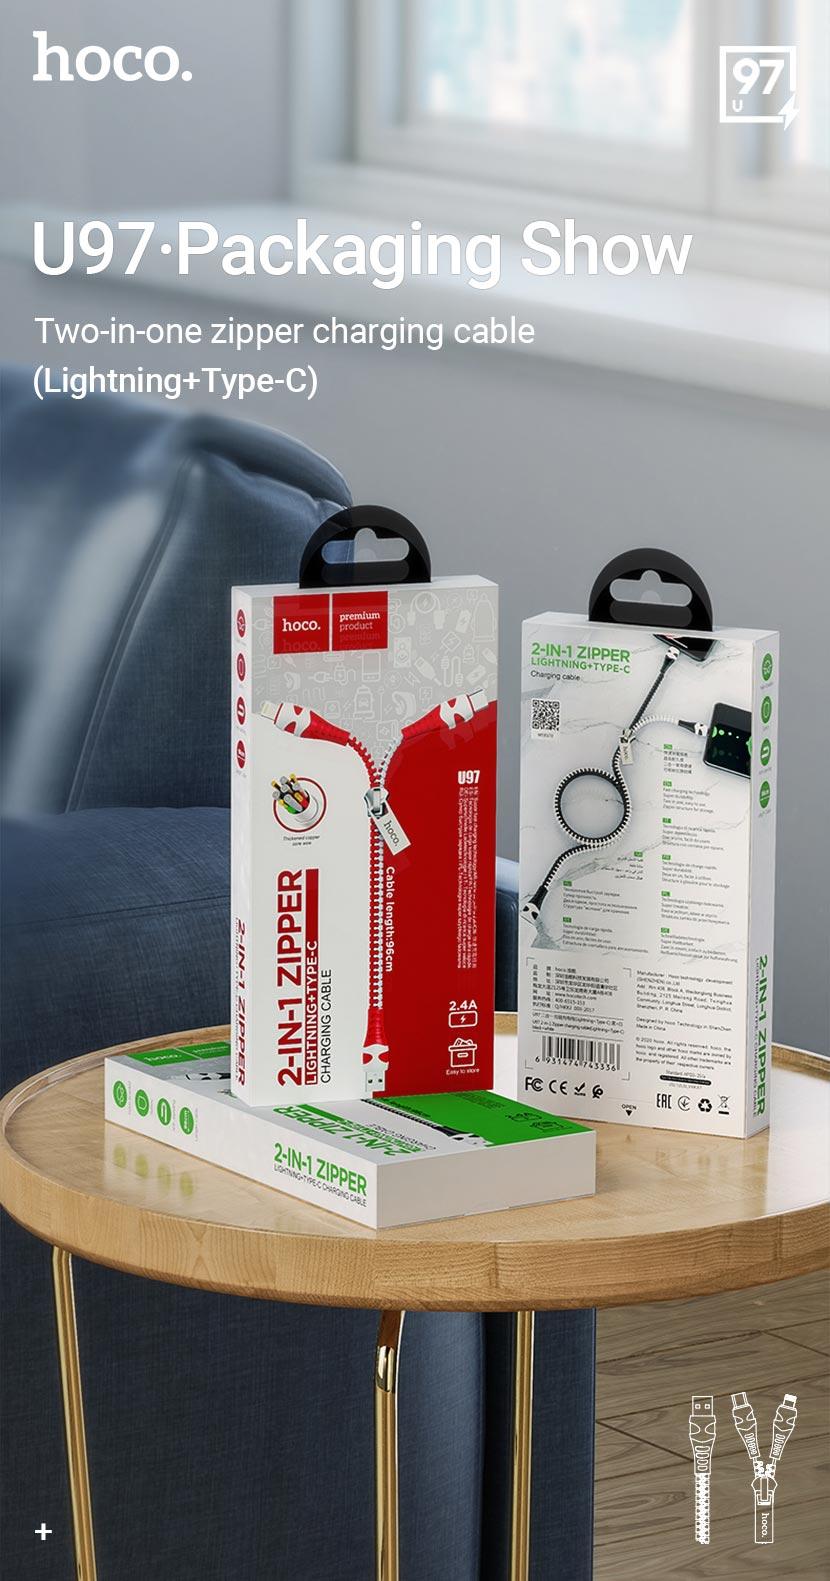 hoco news u97 2in1 zipper charging cable lightning type c package en